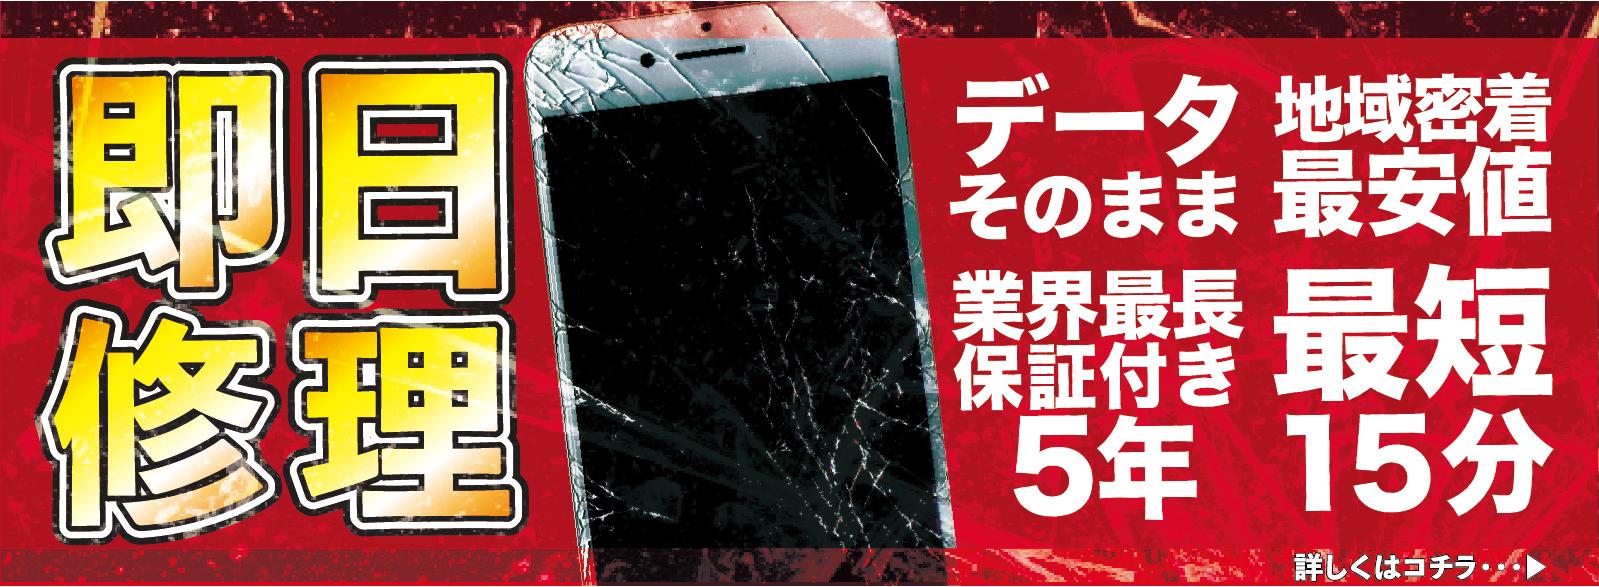 iphone 修理